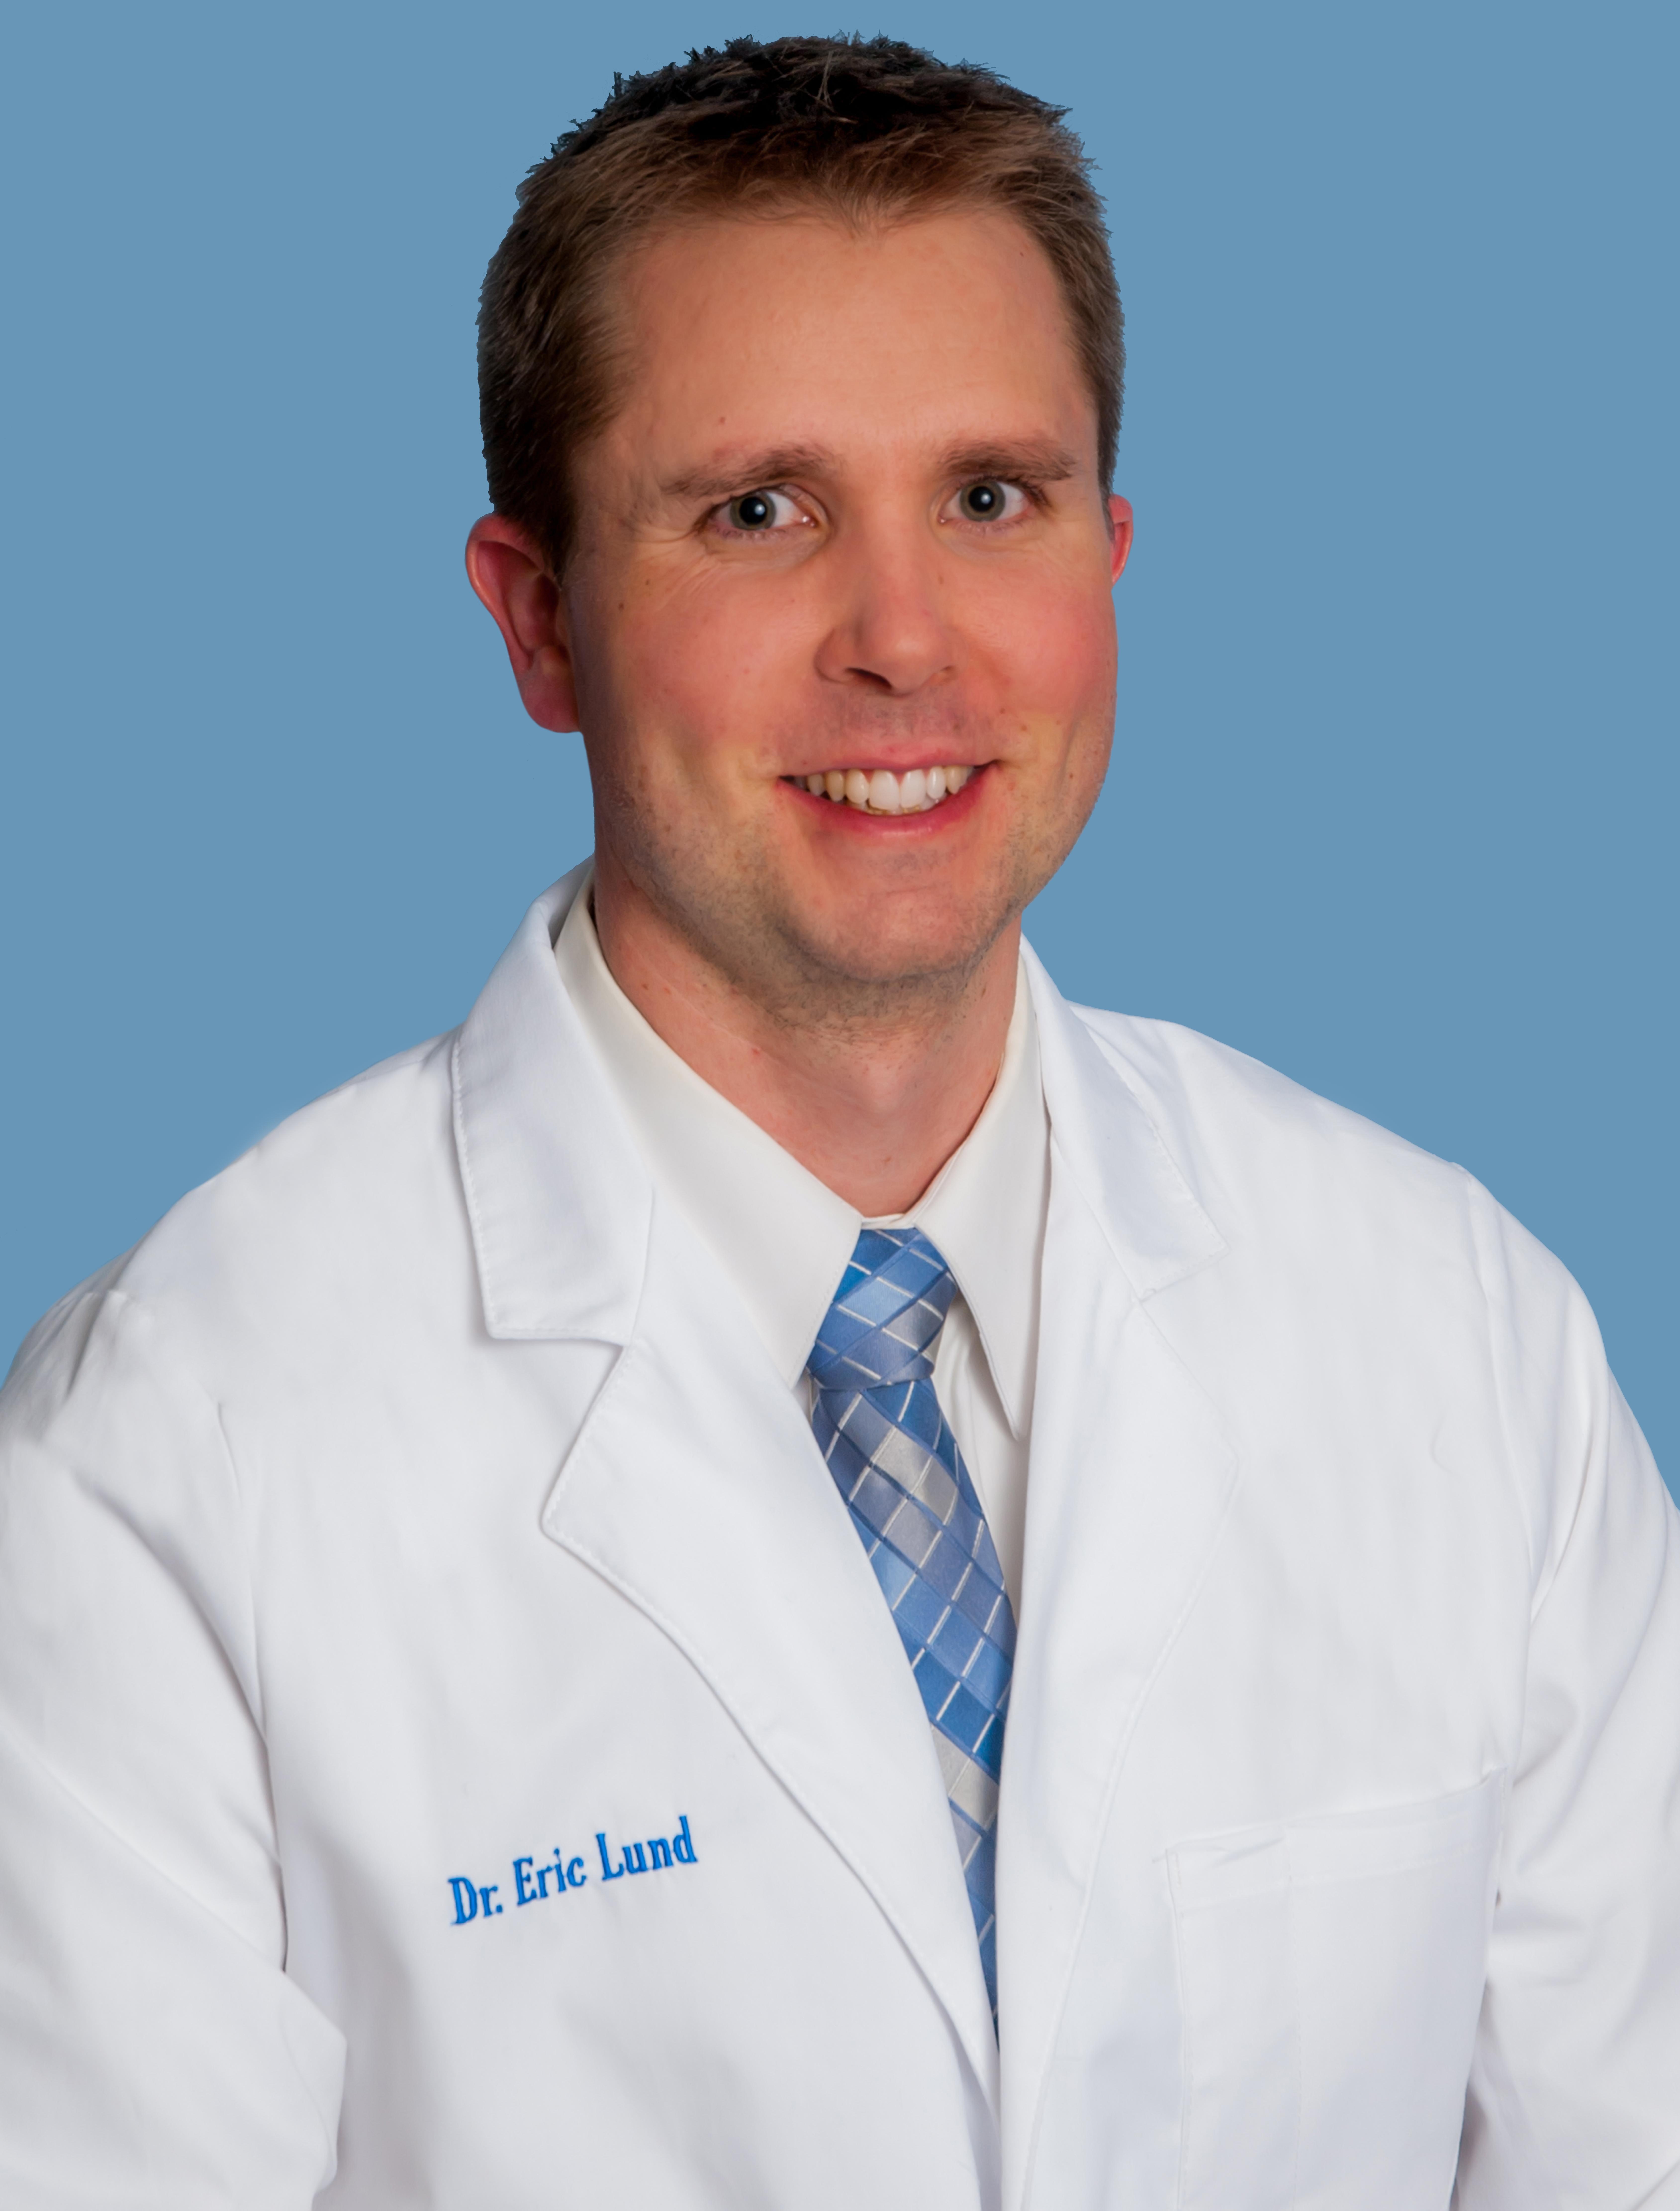 Dr. Eric Lund